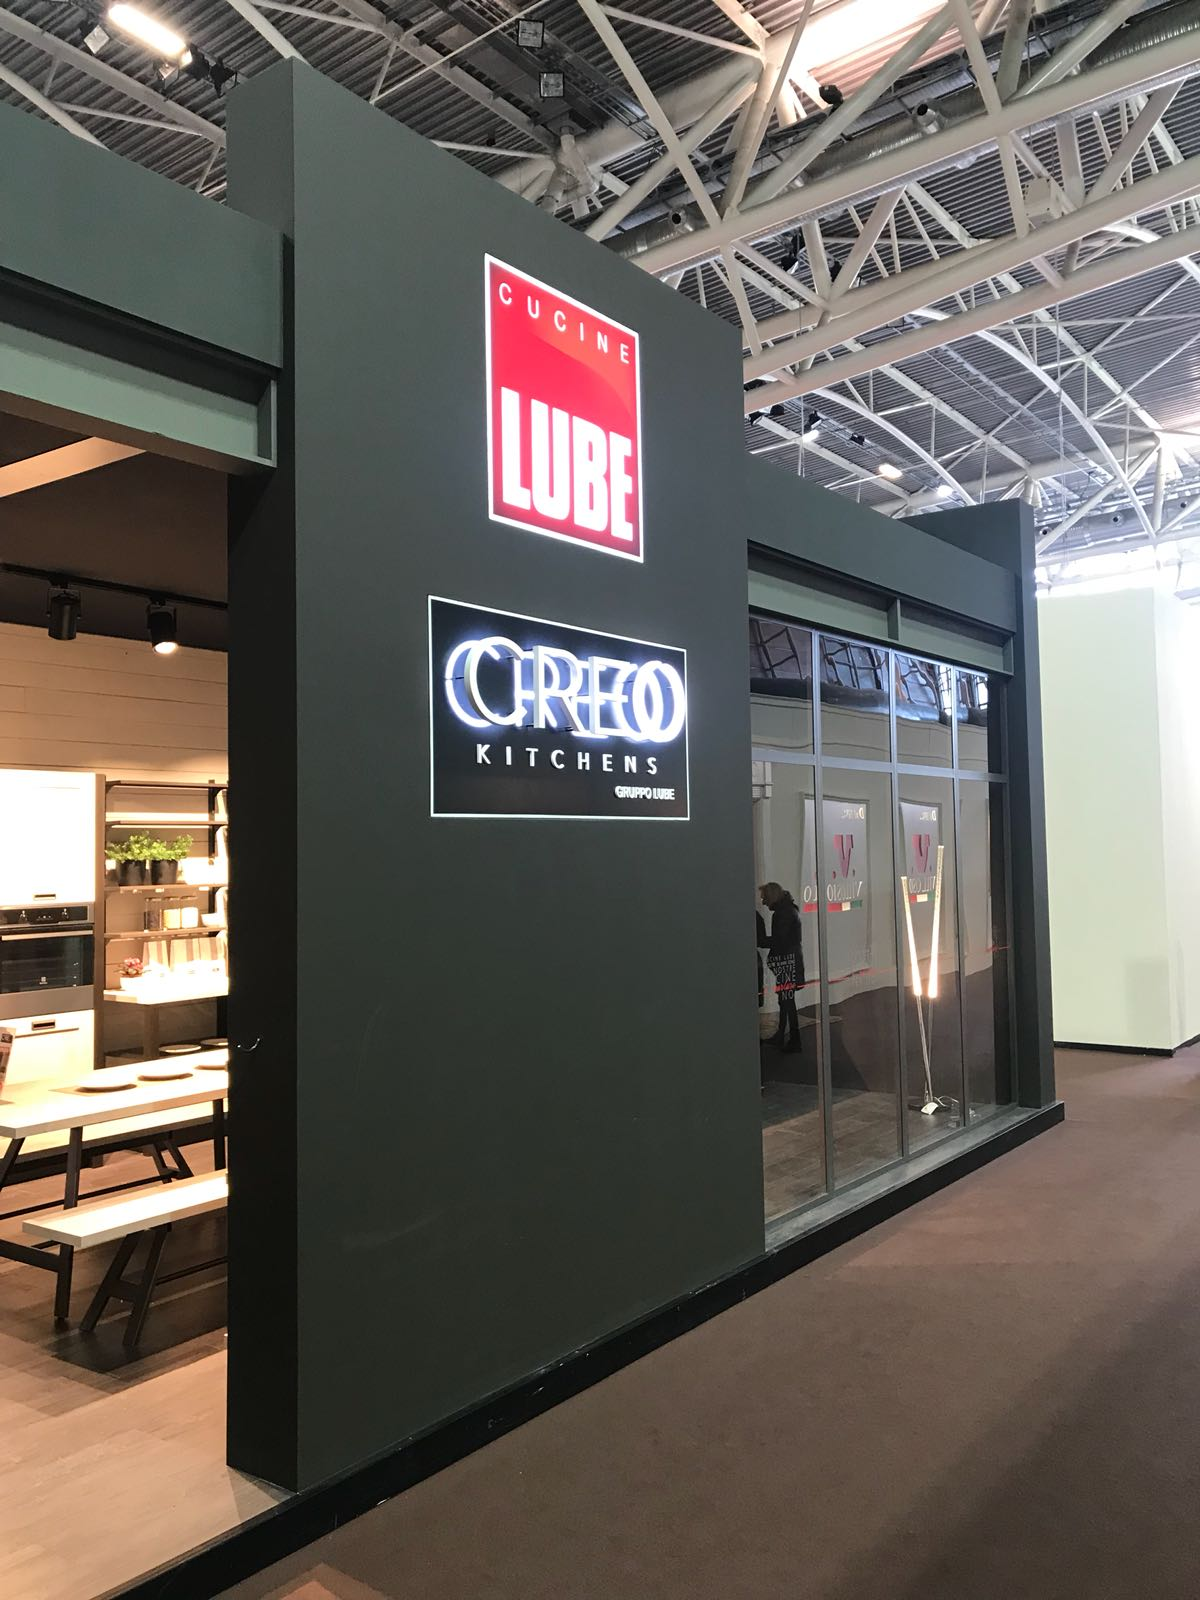 Gruppo LUBE at the 55th Expocasa Torino trade fair - Cucine Lube